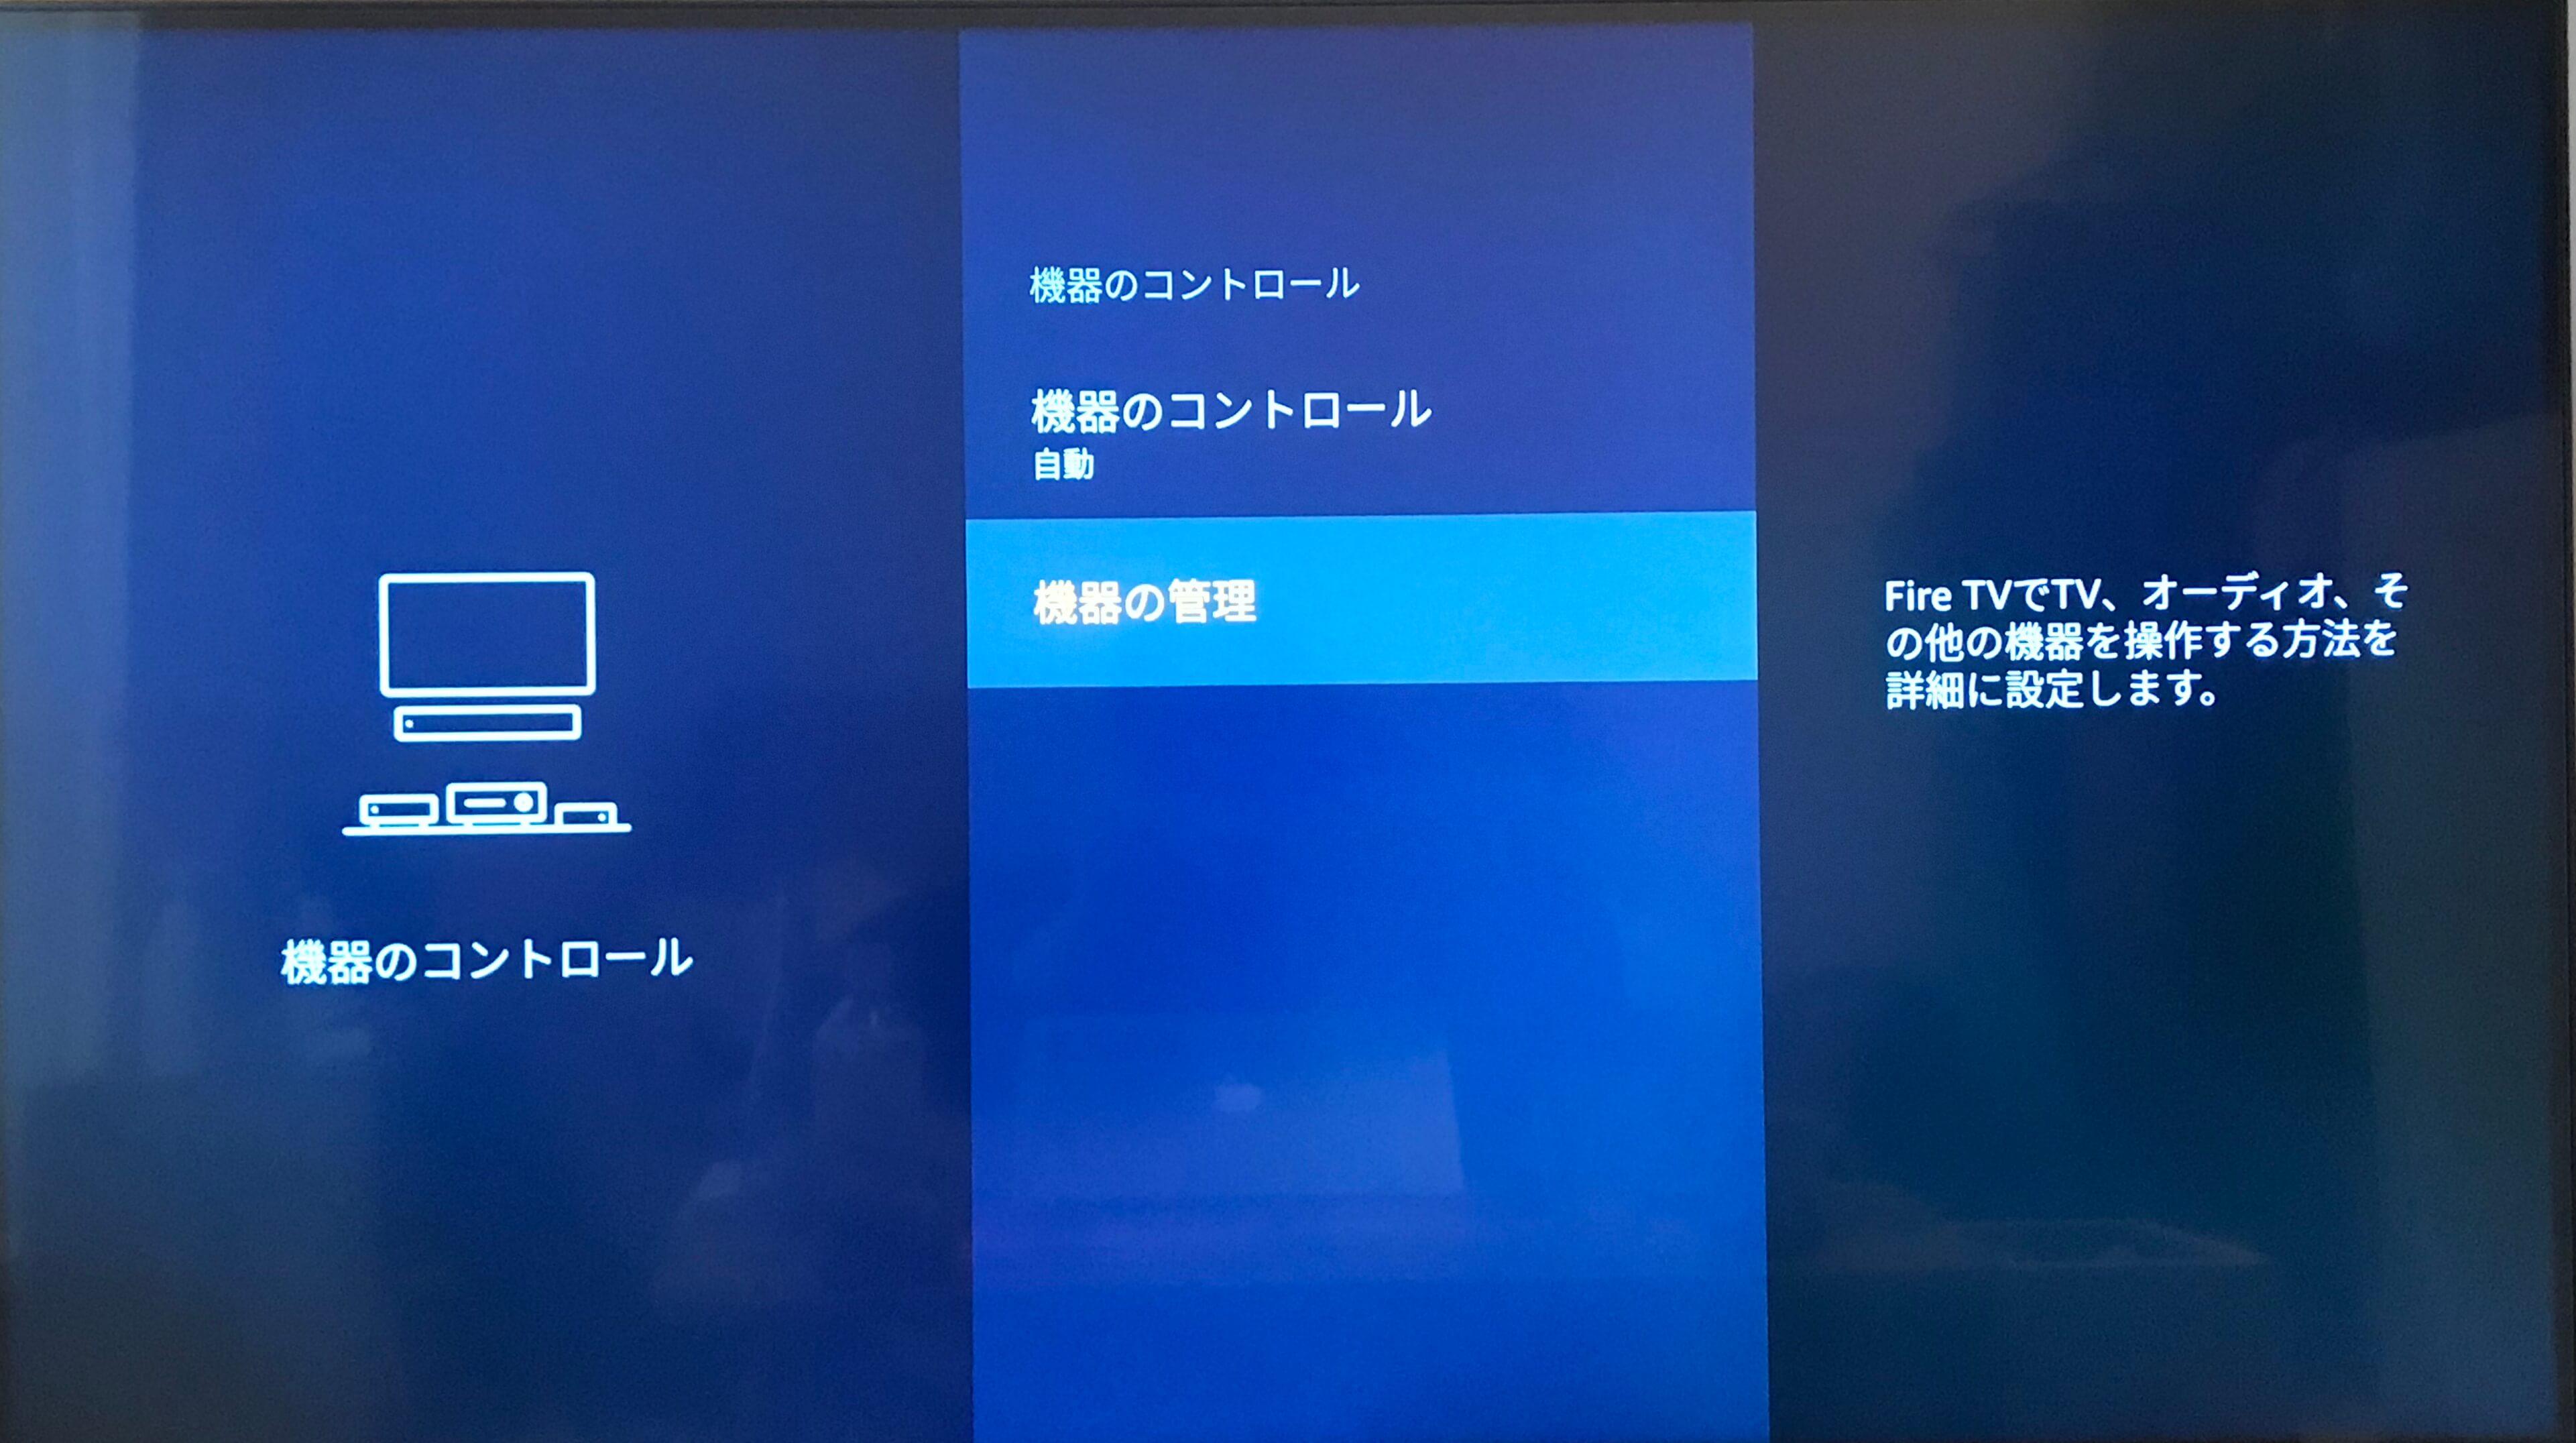 Amazon-fire-TV-stick-4kの設定で機器の選択を行う画面